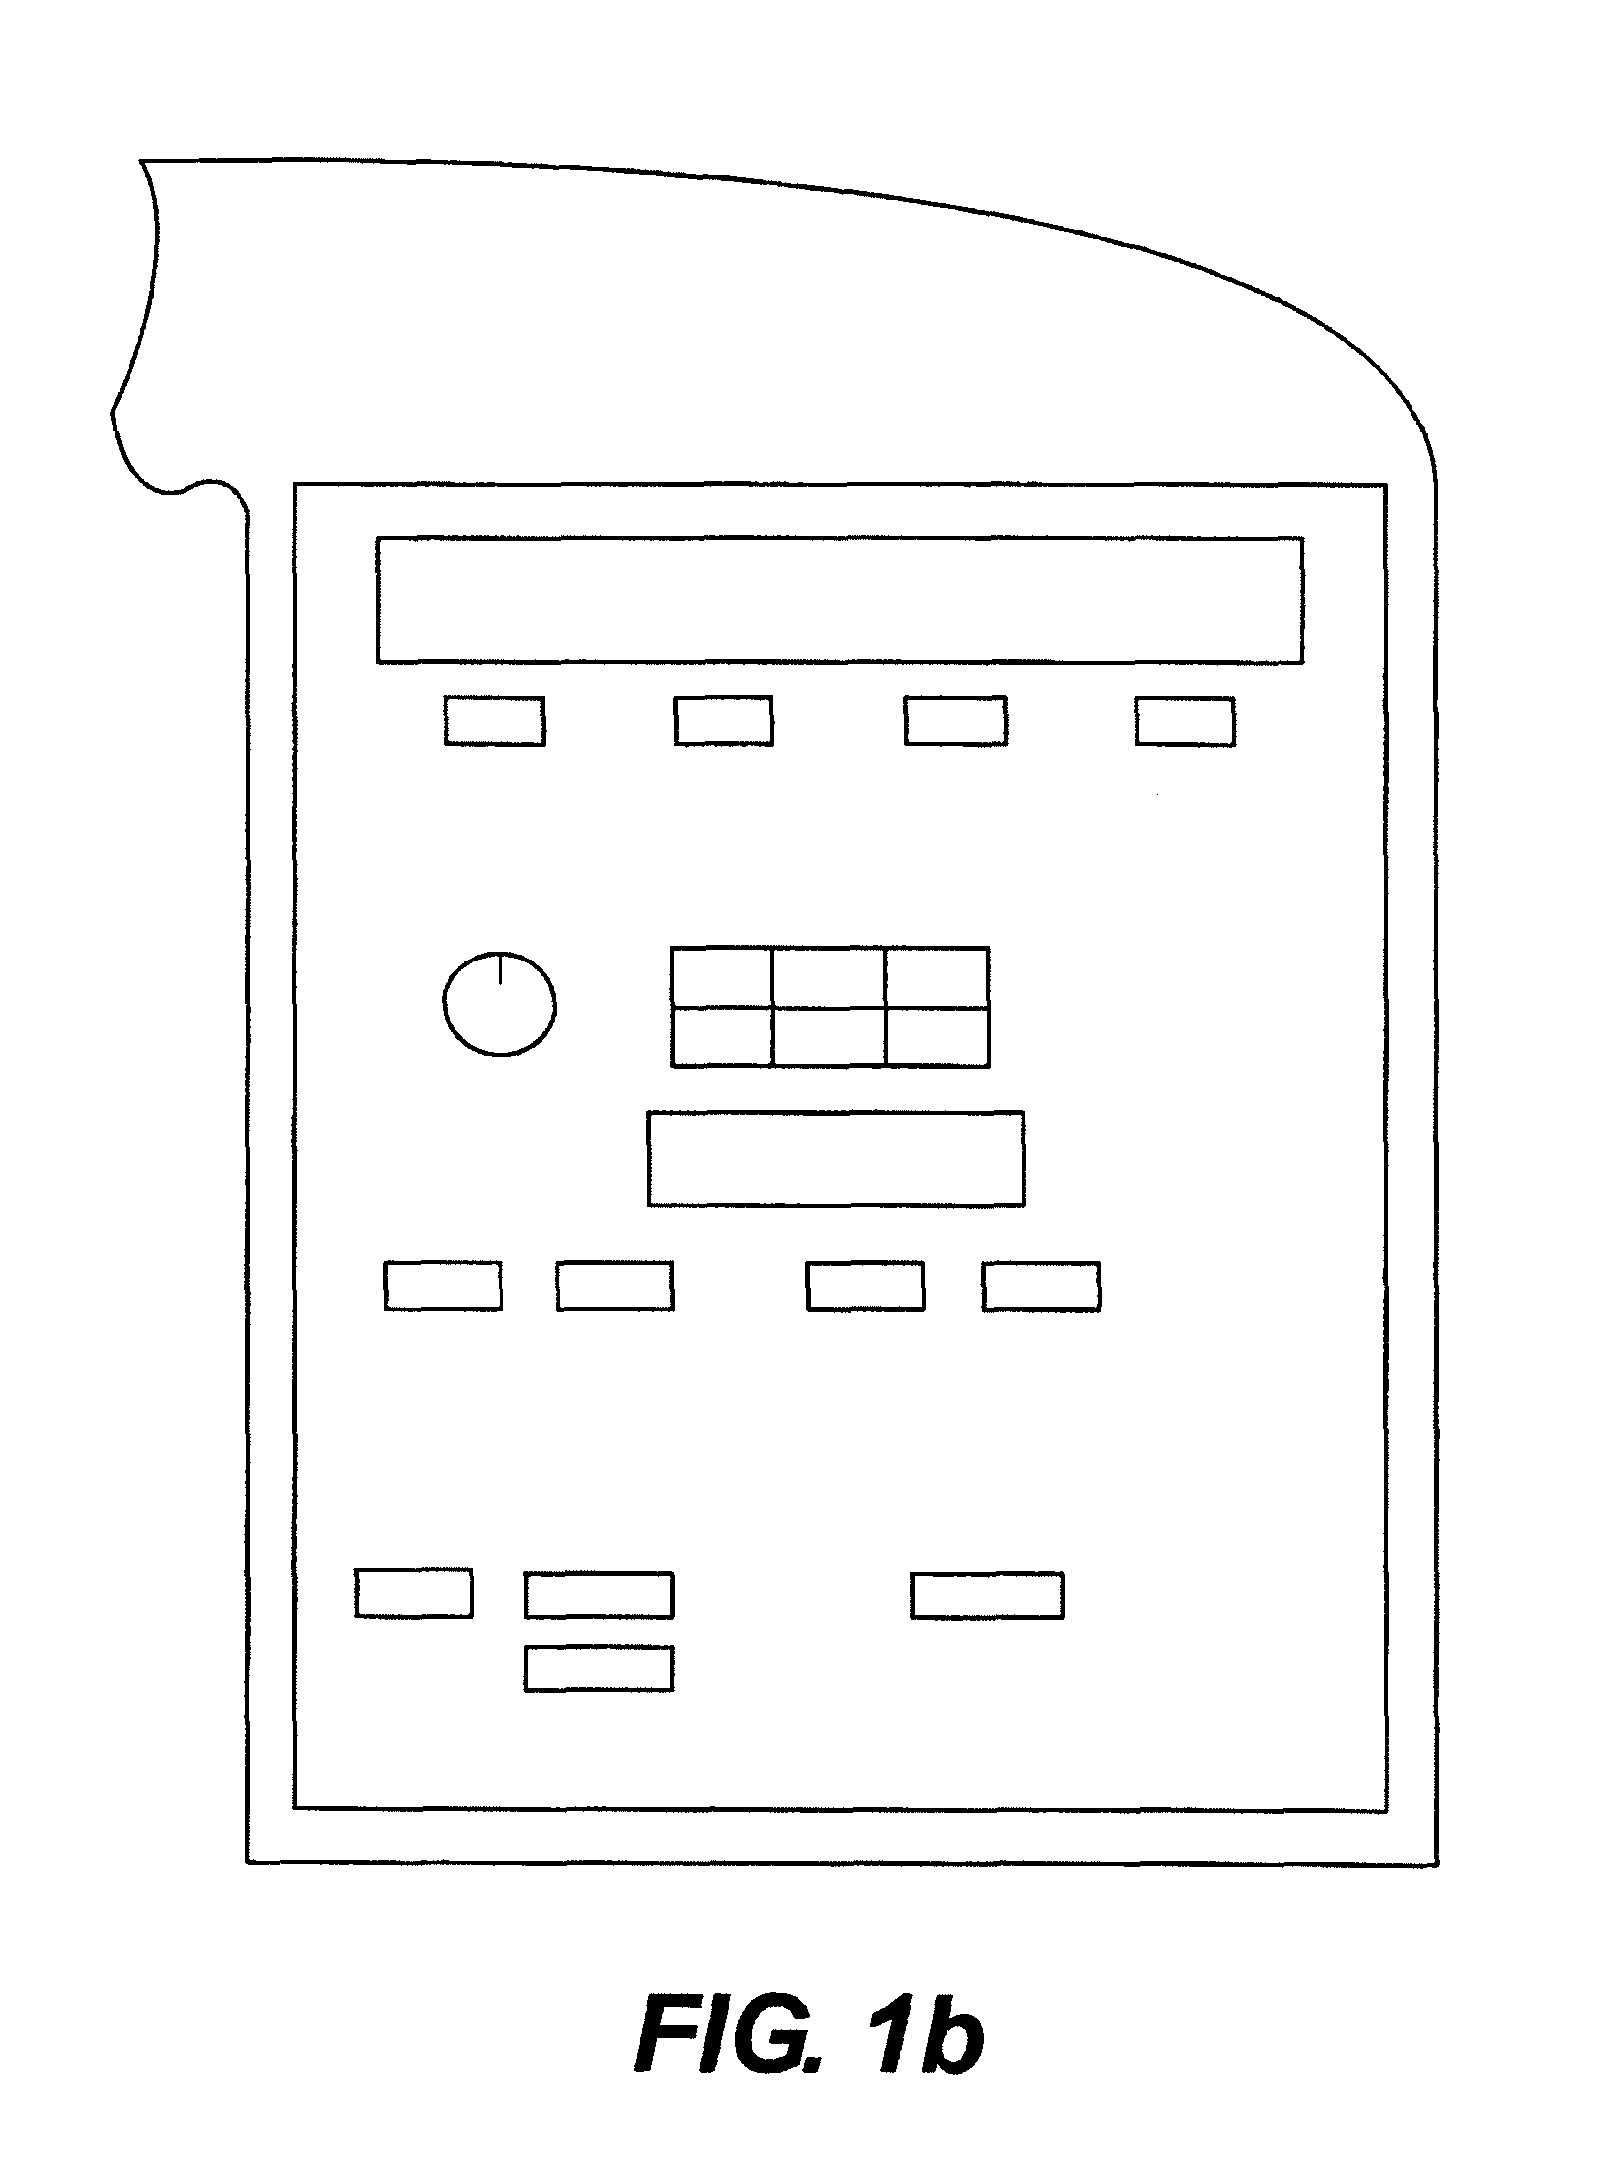 Patent US 9,758,042 B2 on